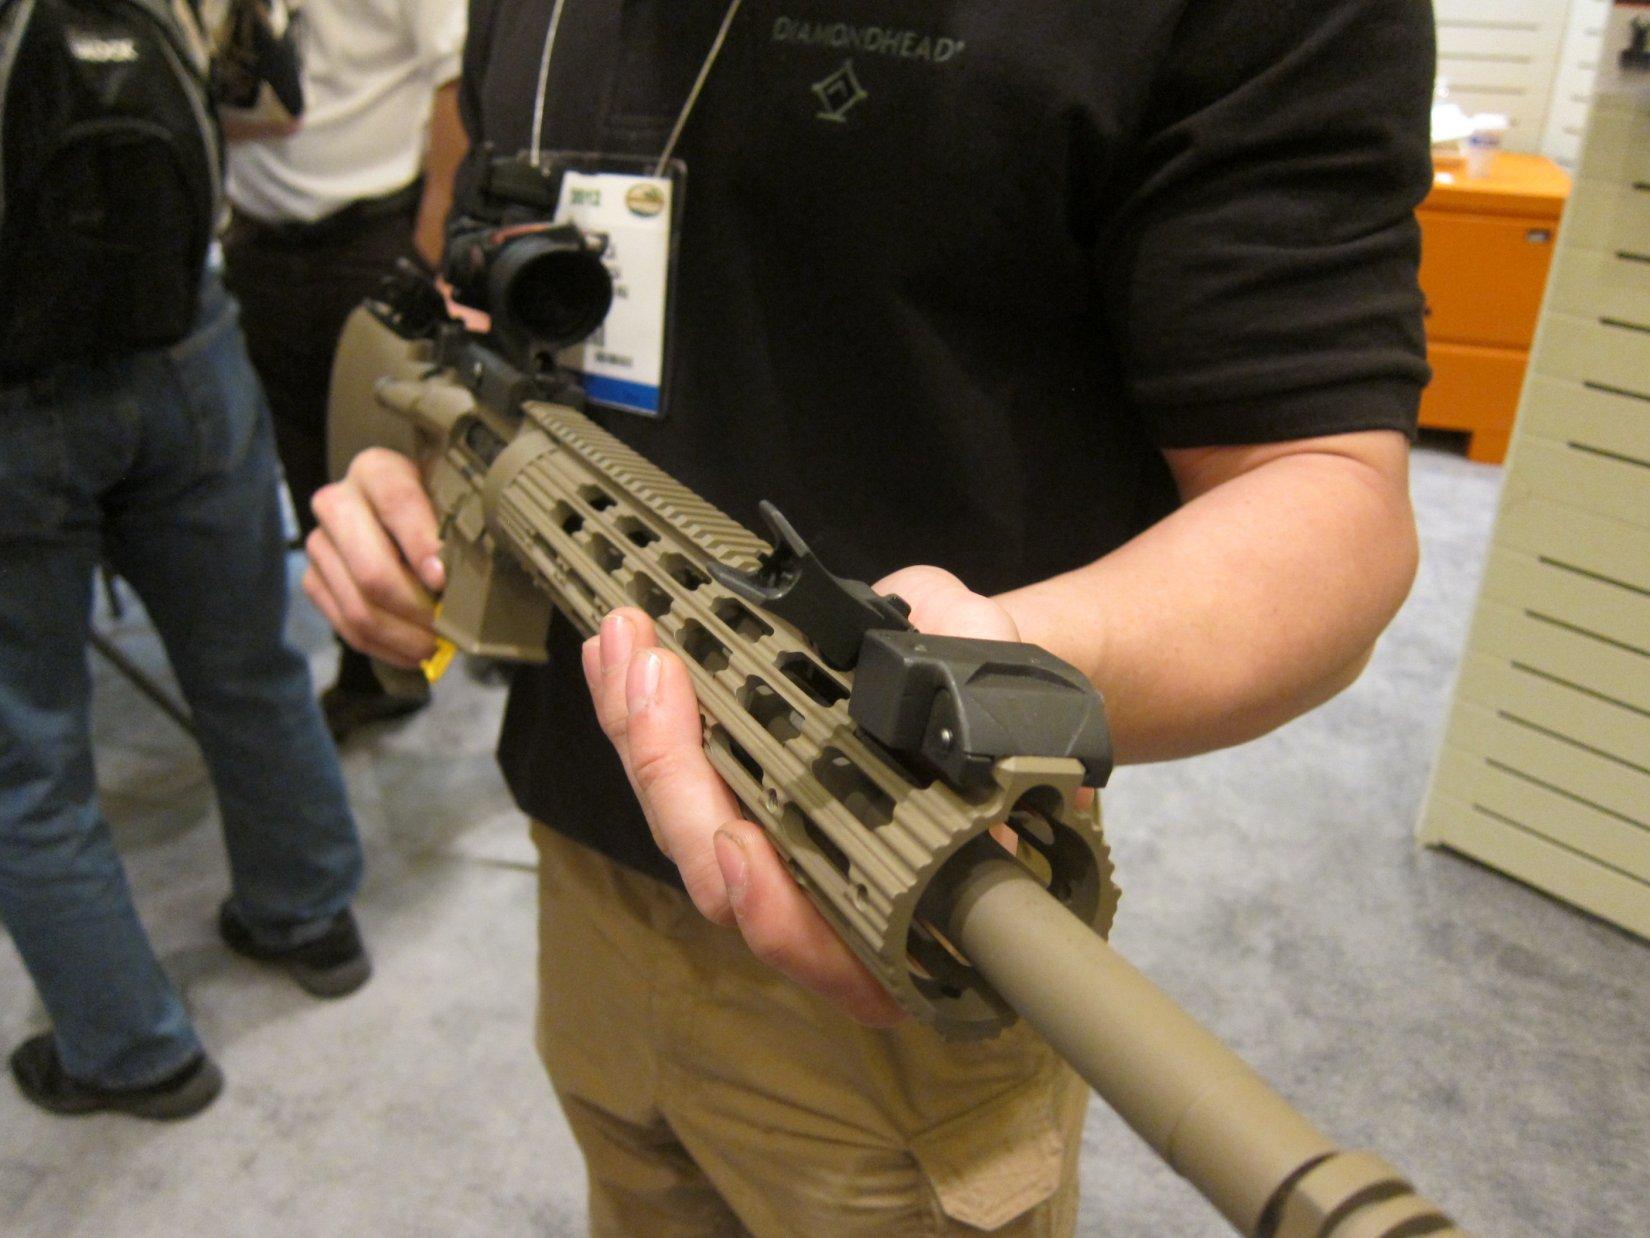 Diamondhead USA 45-Degree-Offset Flip Sights/BUIS (Back-Up Iron Sights) for Tactical AR-15 Rifle/Carbine/SBR/Sub-Carbines